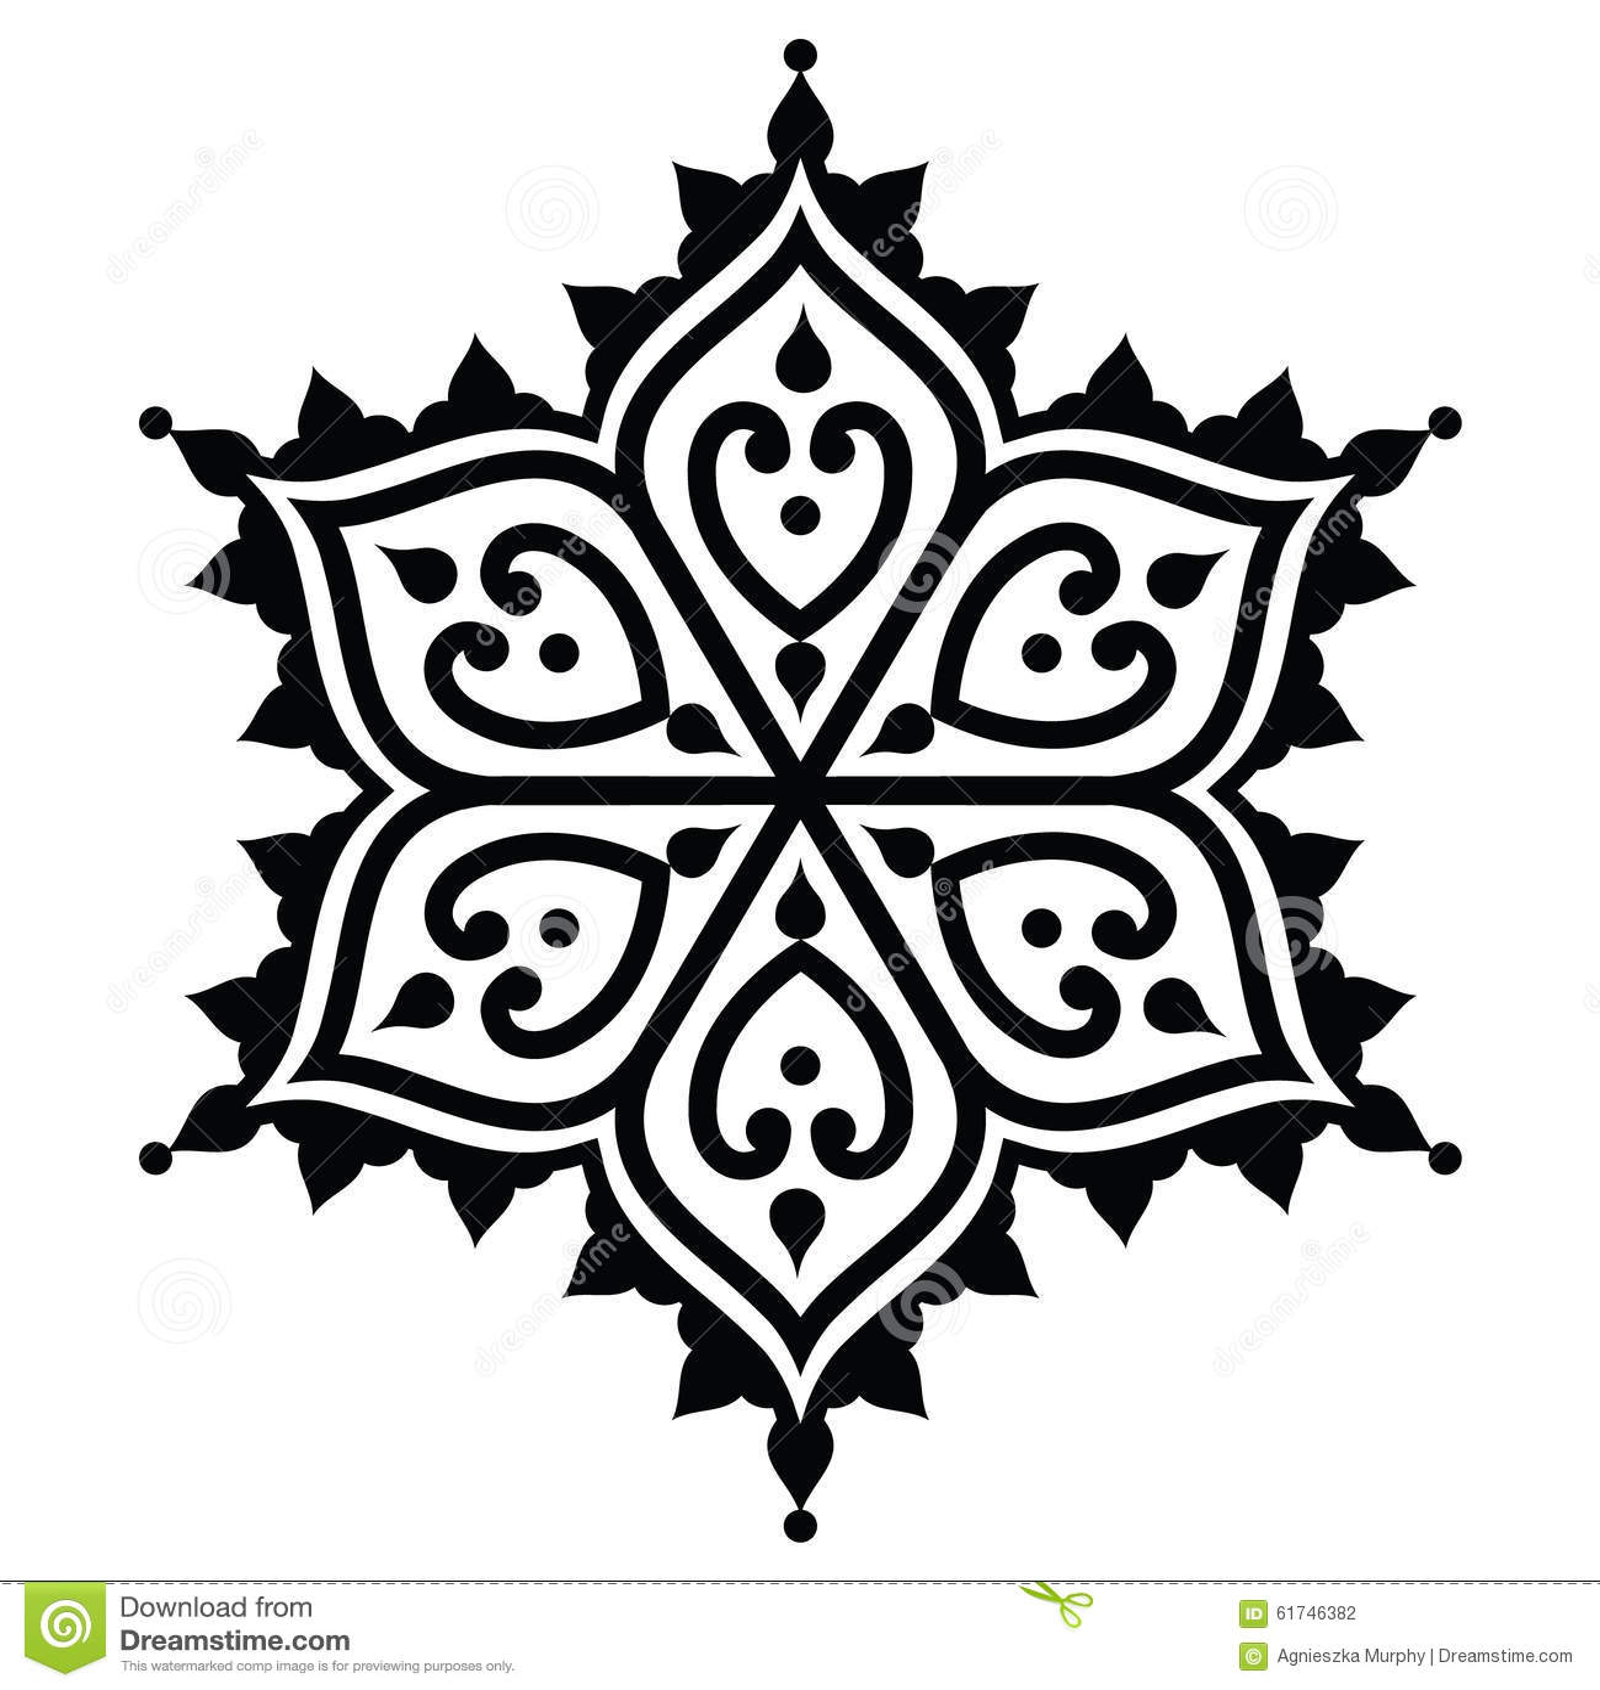 Mehndi Design Line Art : Mehndi indian henna tattoo design star shape stock